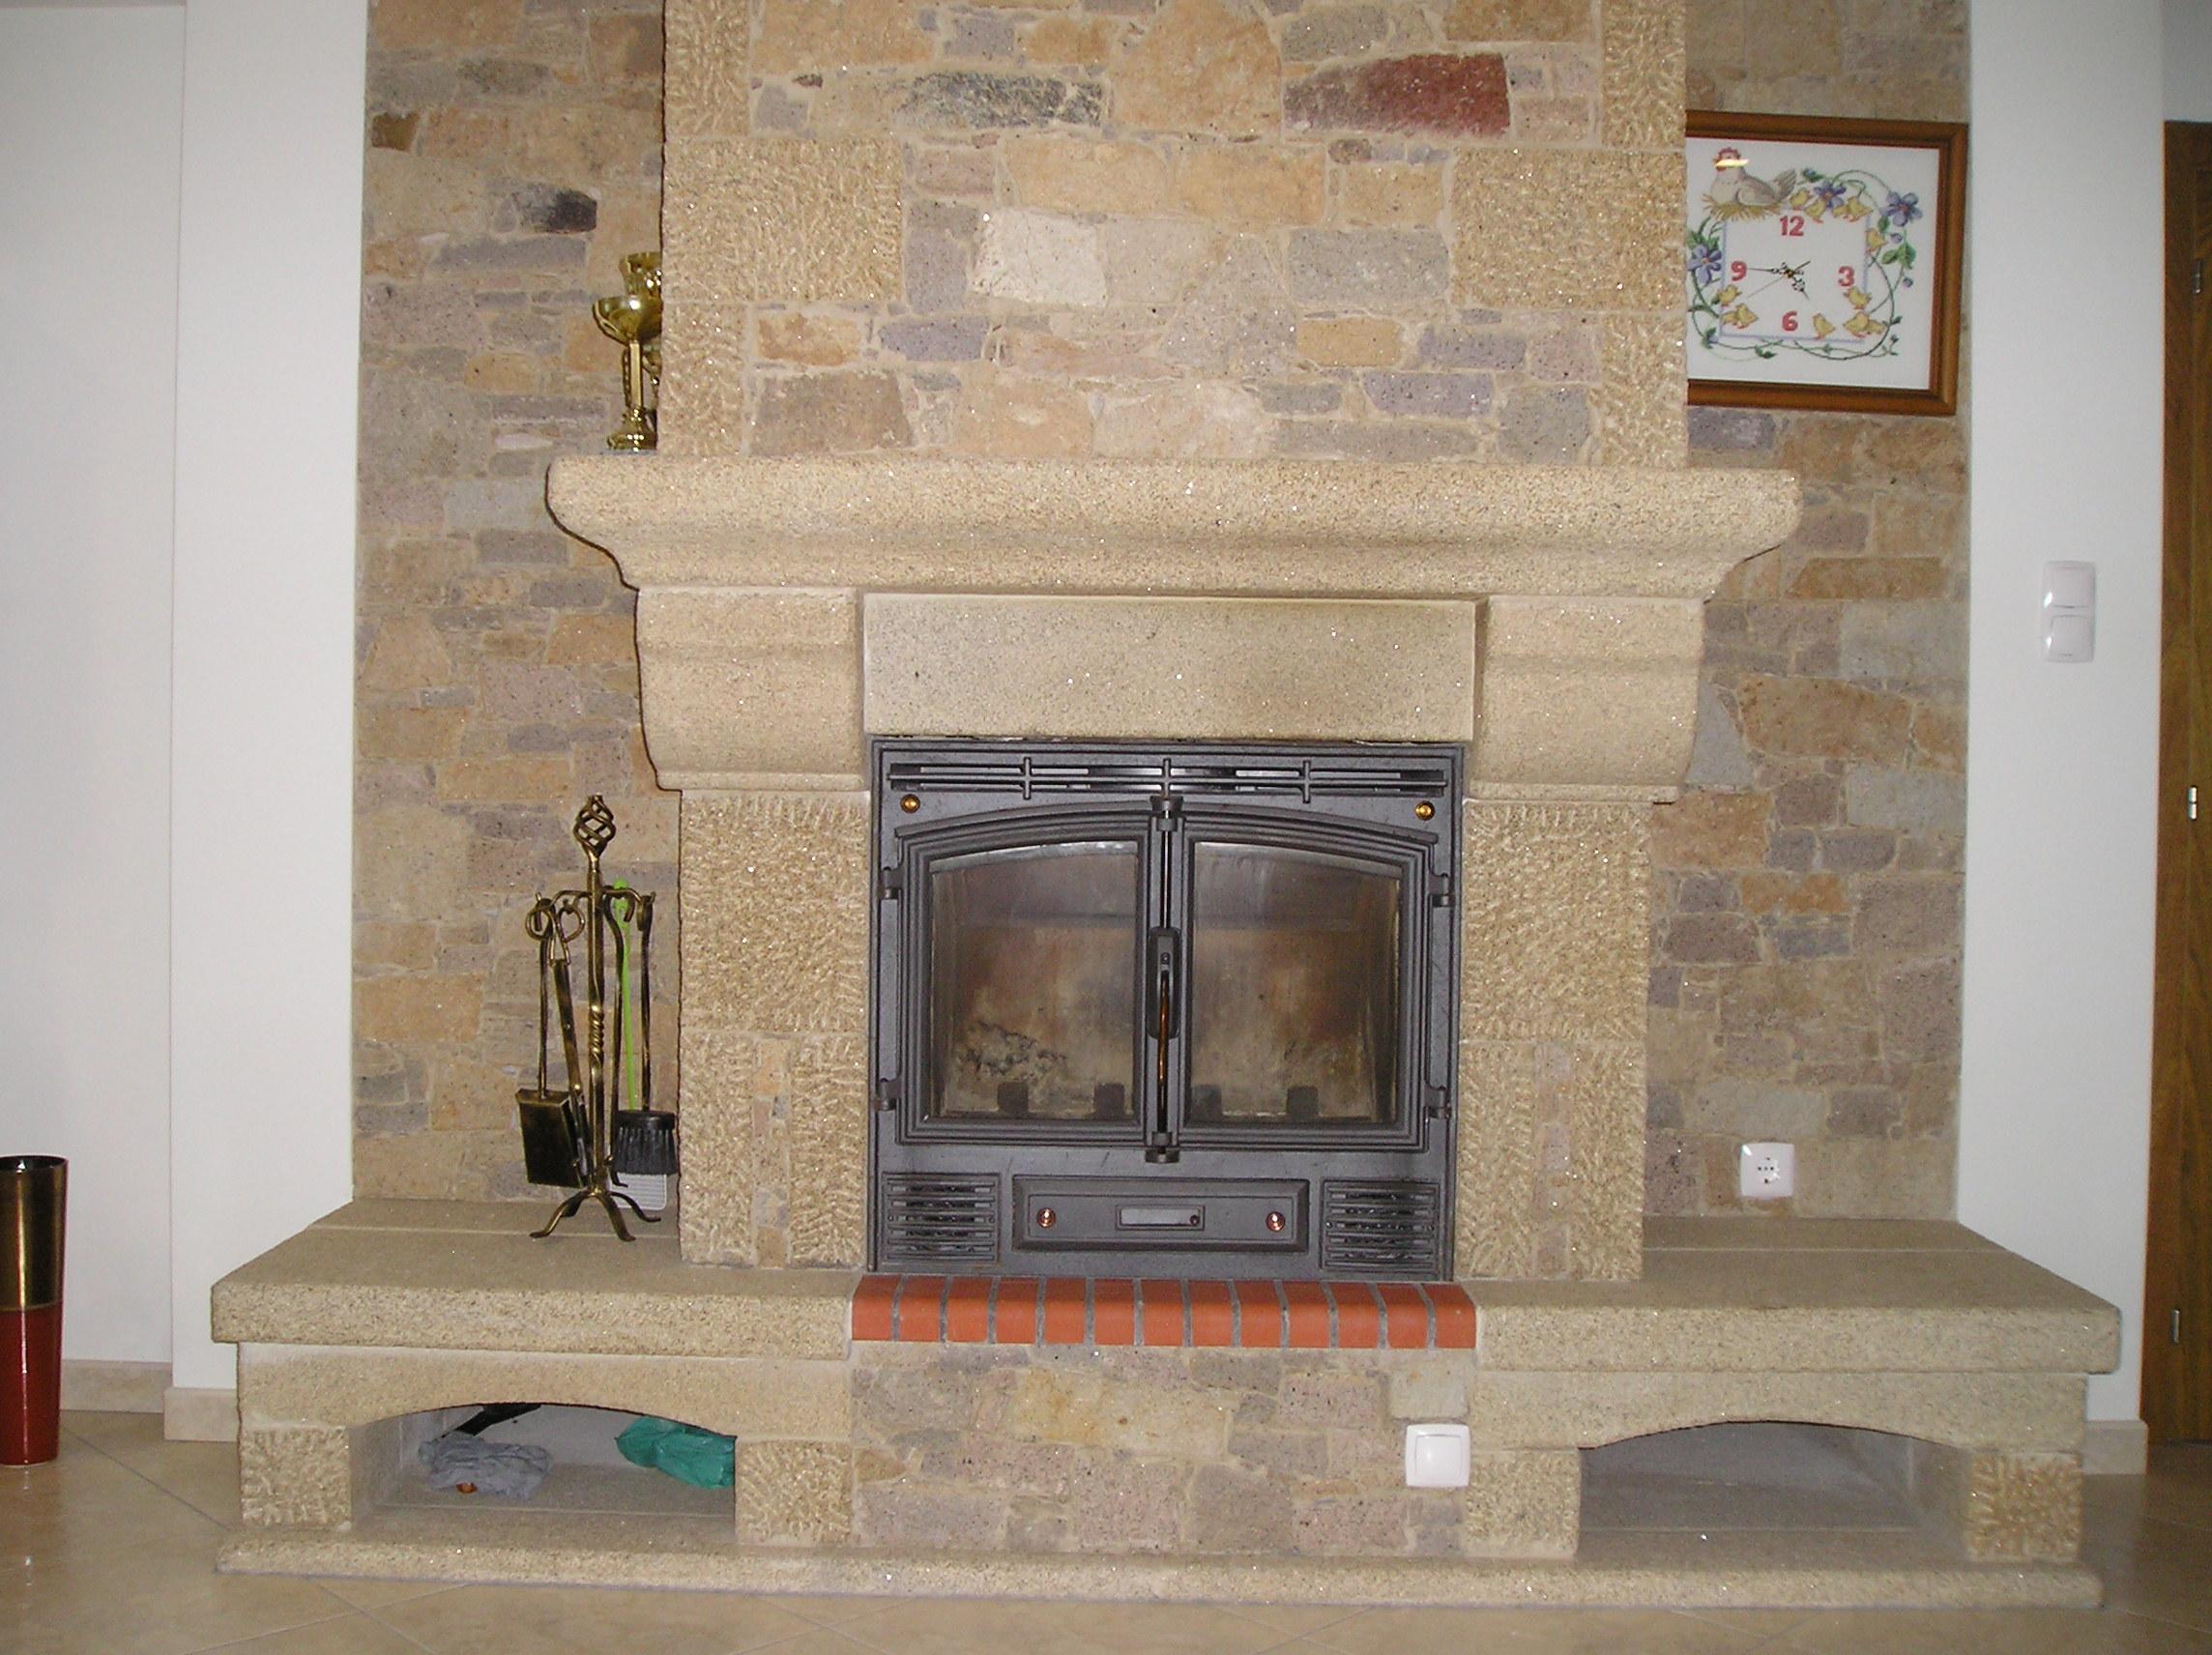 chemine en pierre gallery of nos et ralisations with chemine en pierre supra chemine en pierre. Black Bedroom Furniture Sets. Home Design Ideas